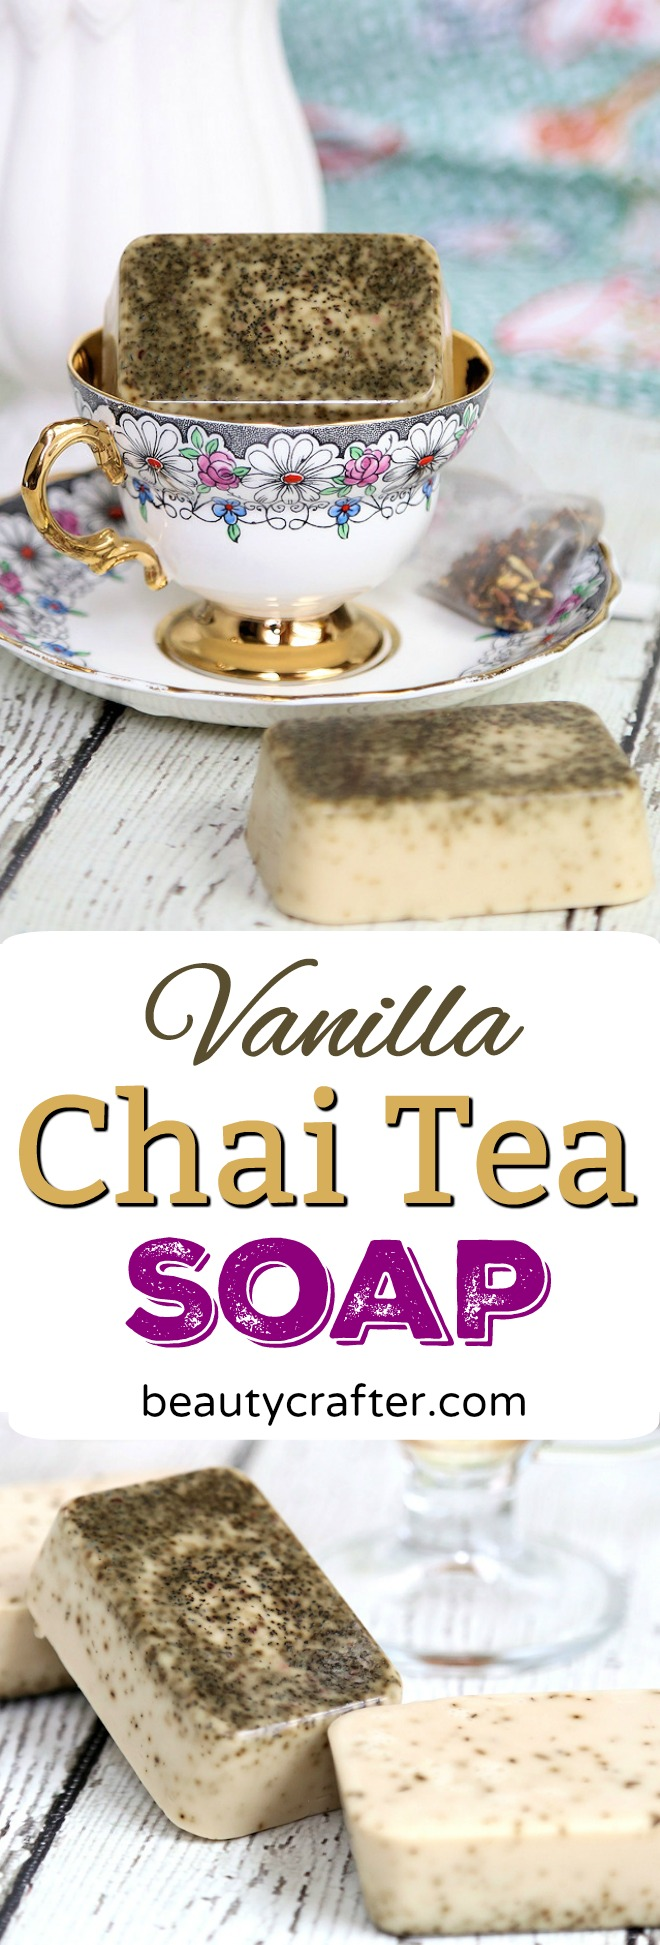 Vanilla Chai Tea Soap Recipe - Easy DIY melt and pour chai soap #chai #tea #soap #soapmaking #diygift